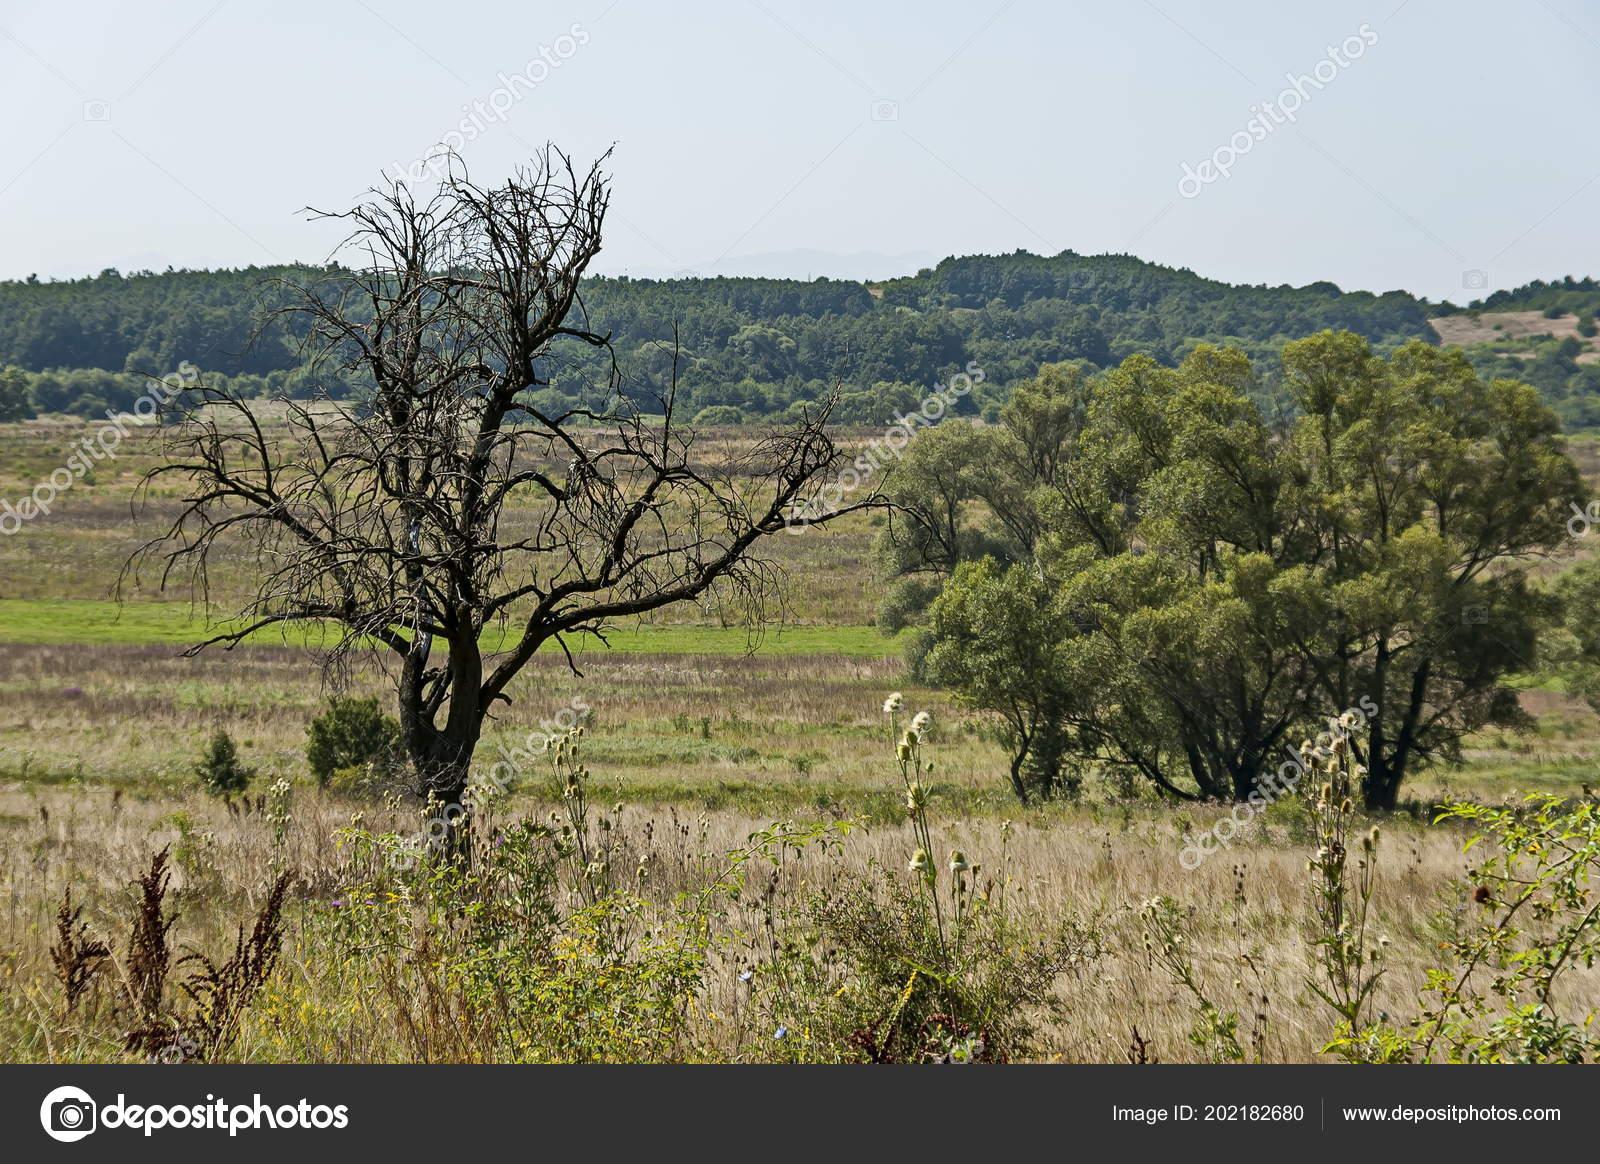 Landscape Summer Nature Green Glade Flower Forest Big White Willow